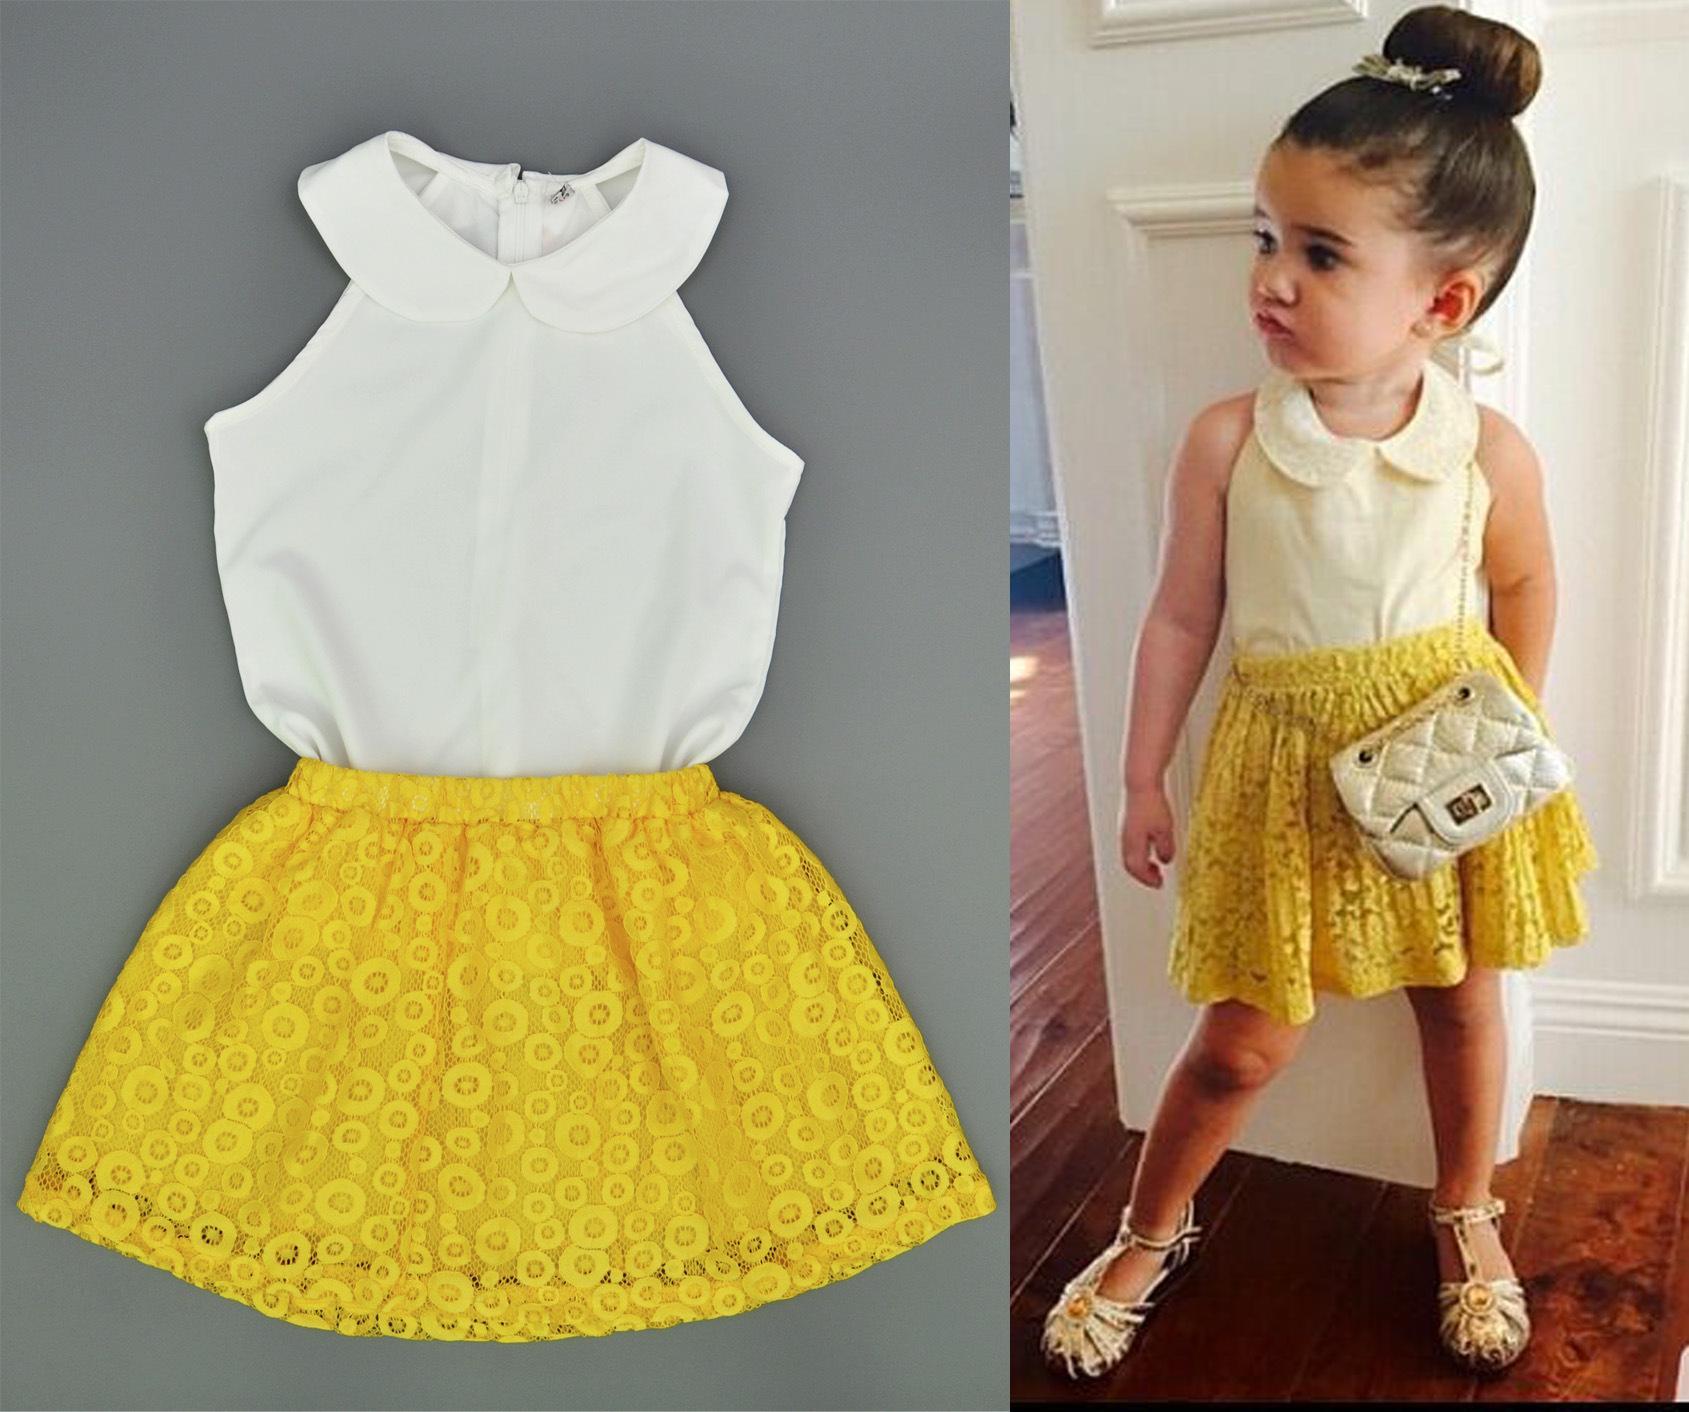 68713072fc07 2018 Summer Baby Girl Clothes Sets Sleeveless White Chiffon Shirts+ ...